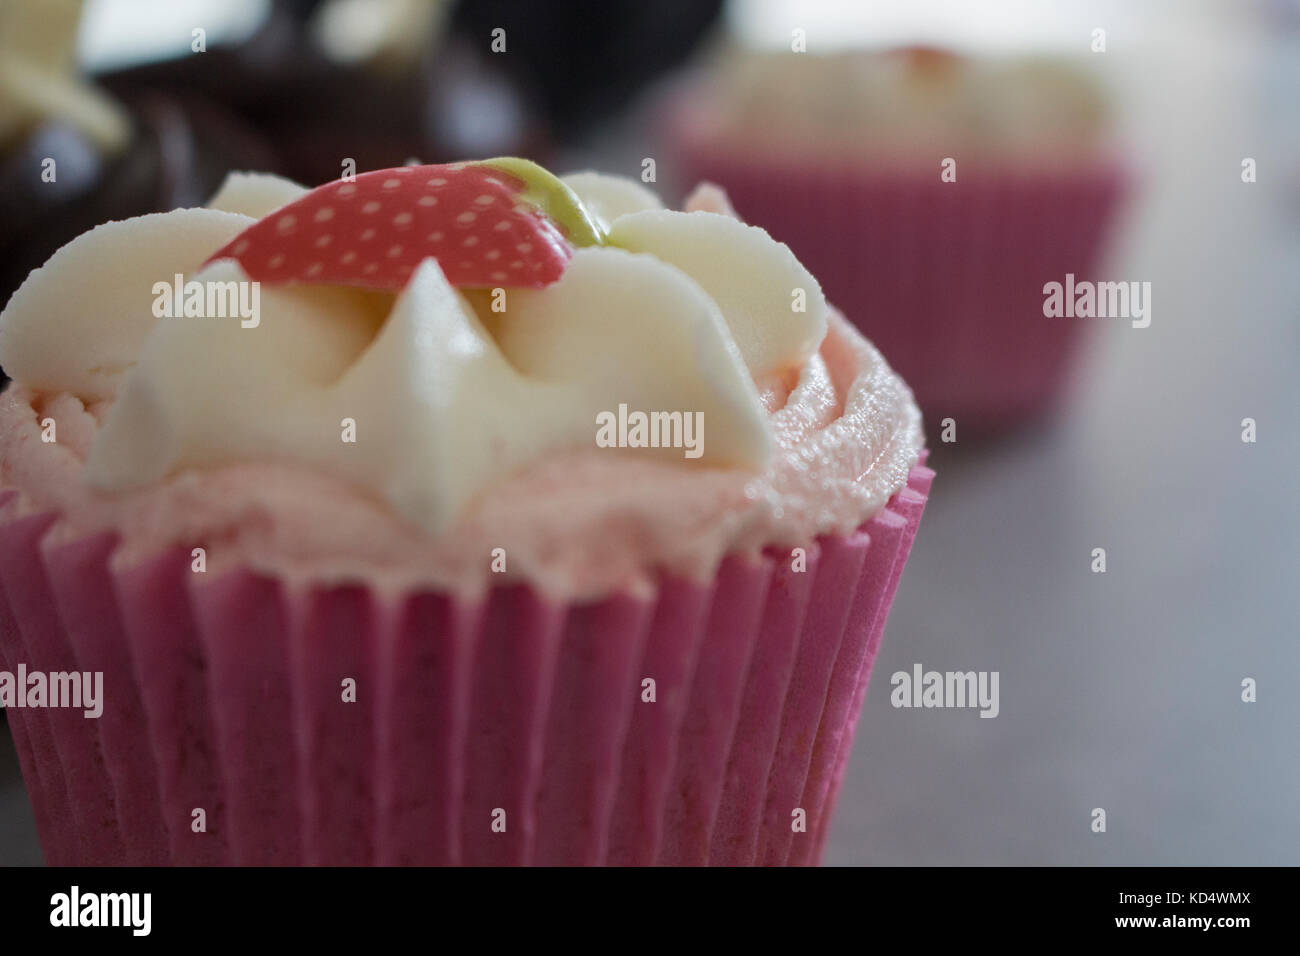 Strawberry and Chocolate Cupcakes Accompanied by Hot Chocolate with Cream and Chocolate dusting. - Stock Image